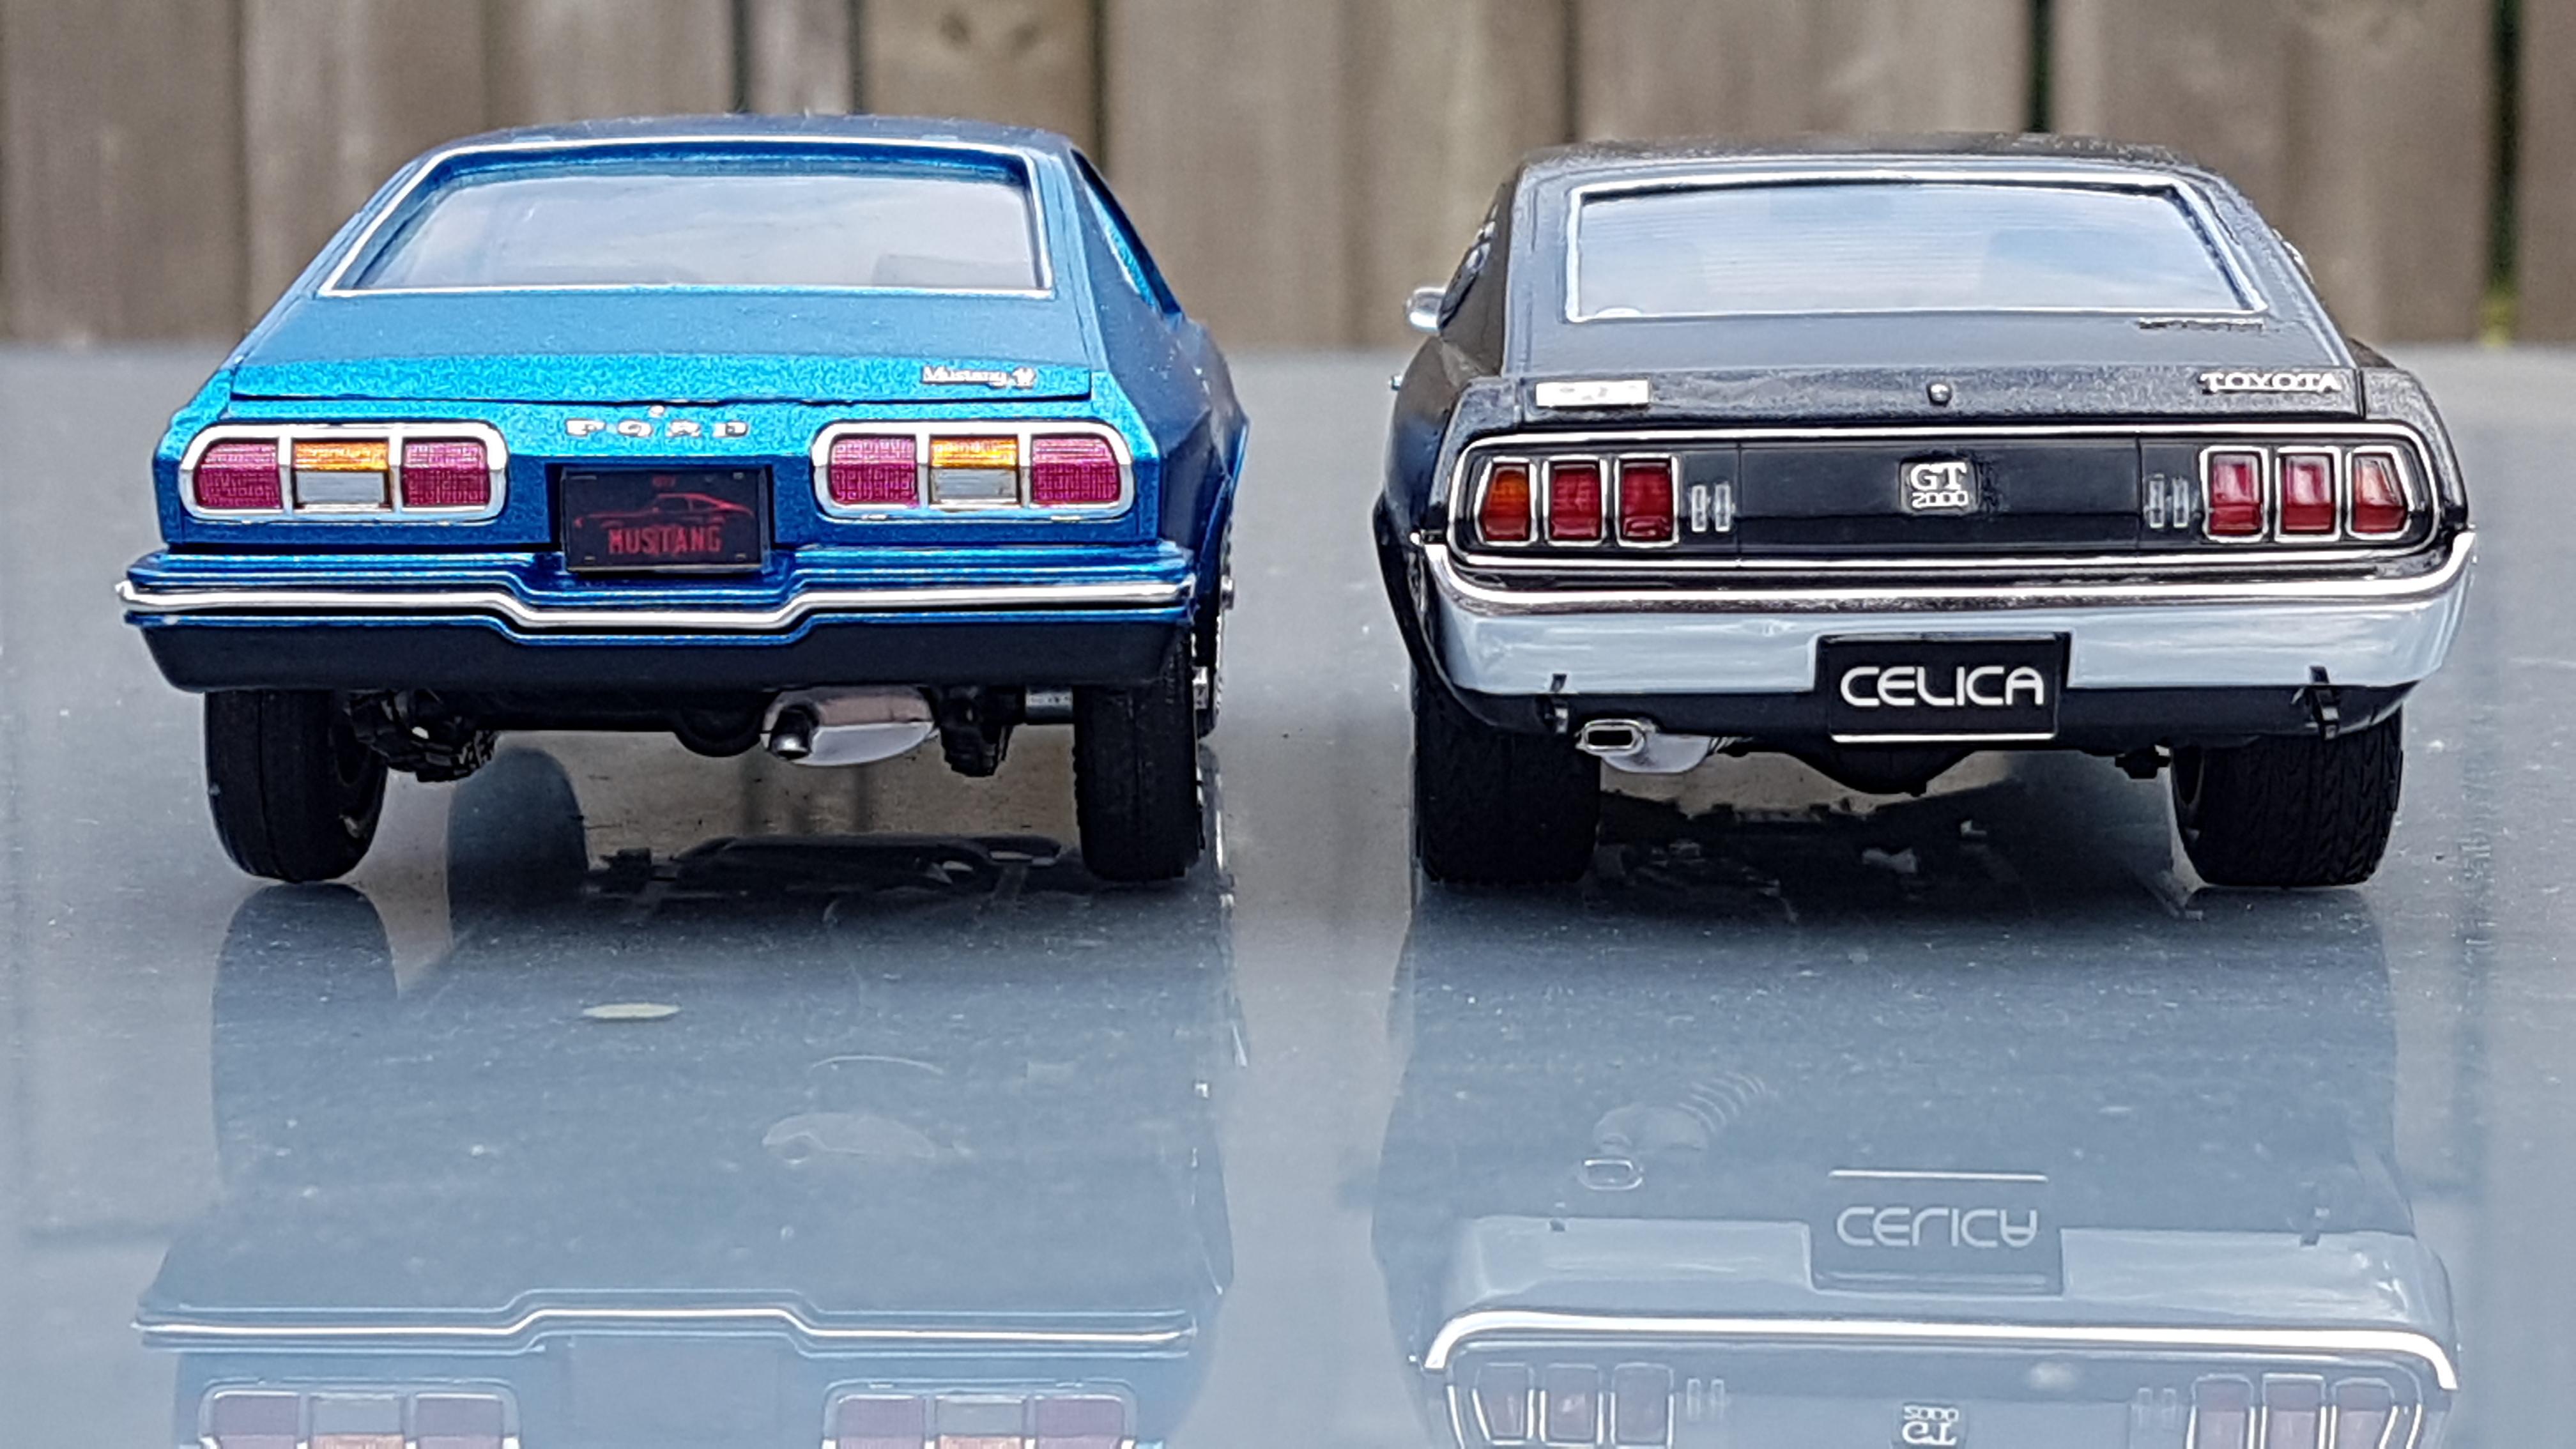 1973 Toyota Celica Liftback 2000 Gt